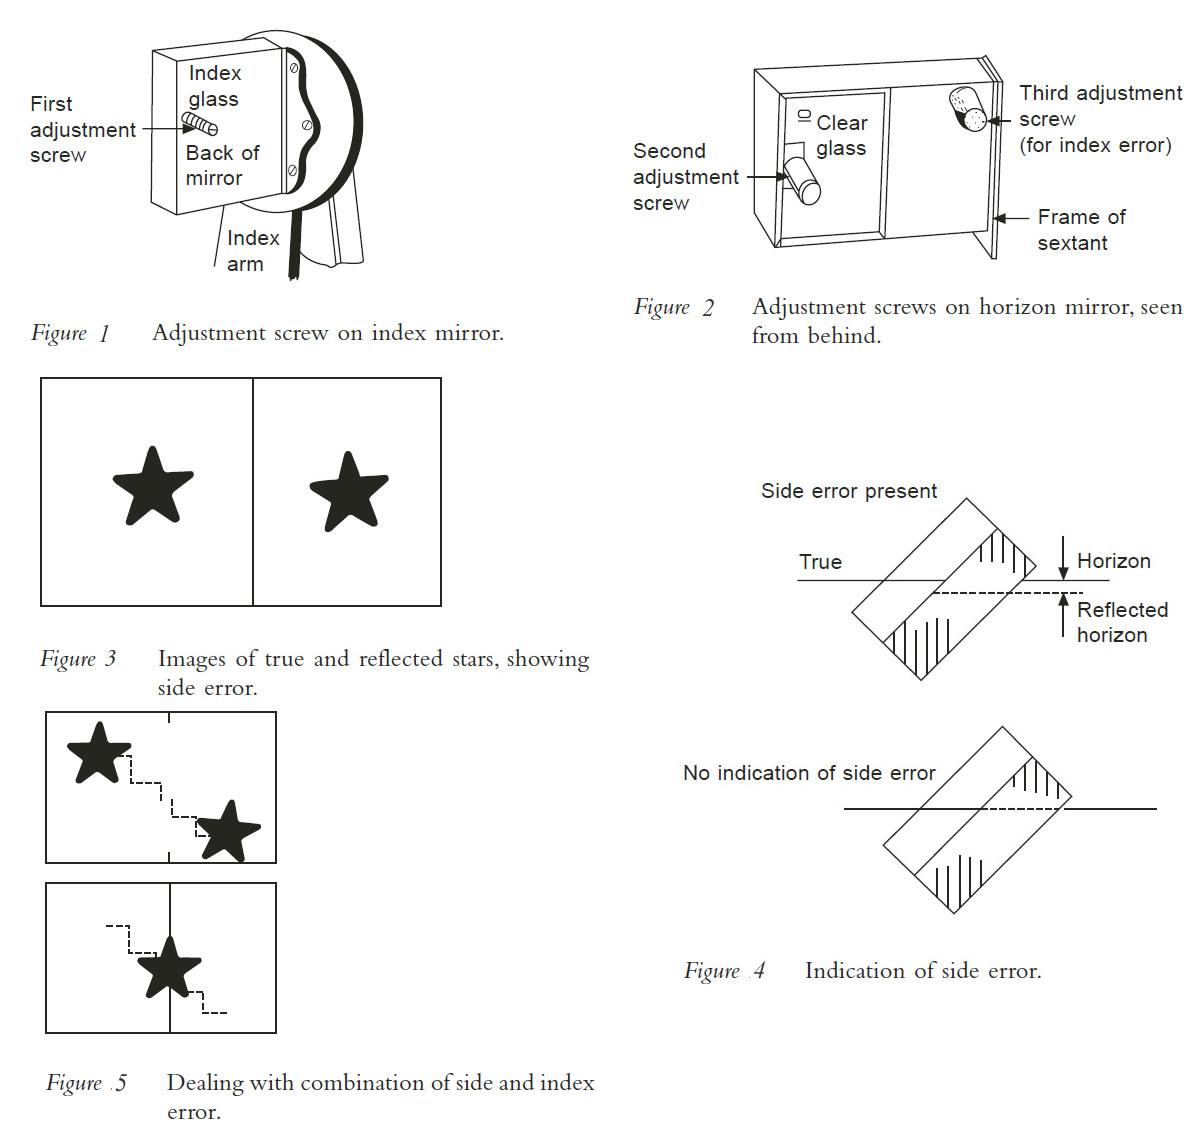 how to adjust marine sextant errors